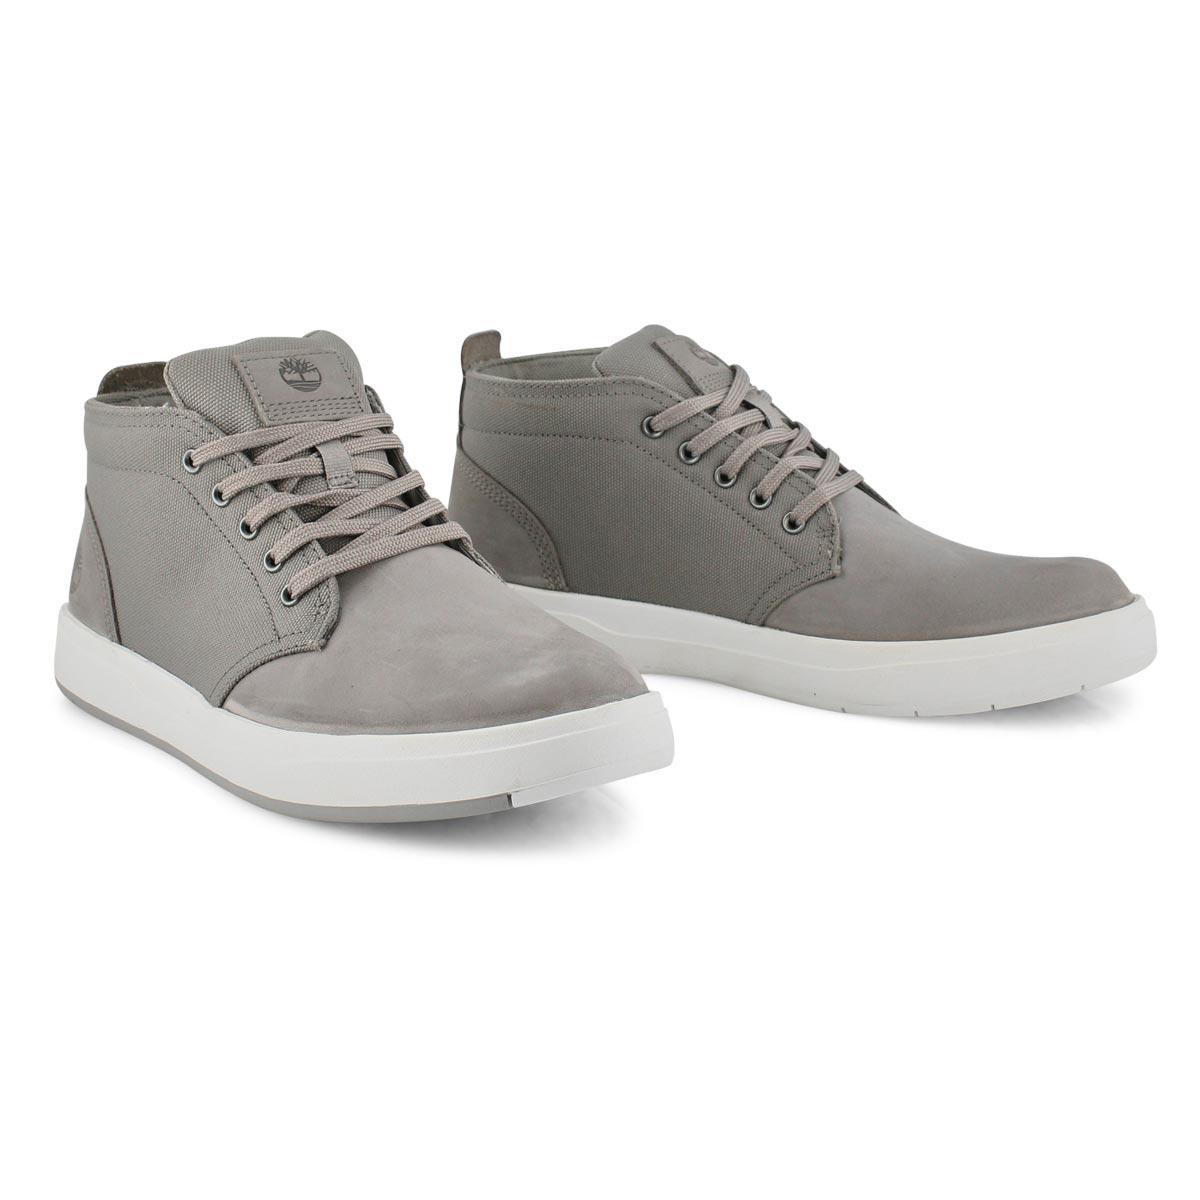 Men's Davis Square Chukka Boot - Grey